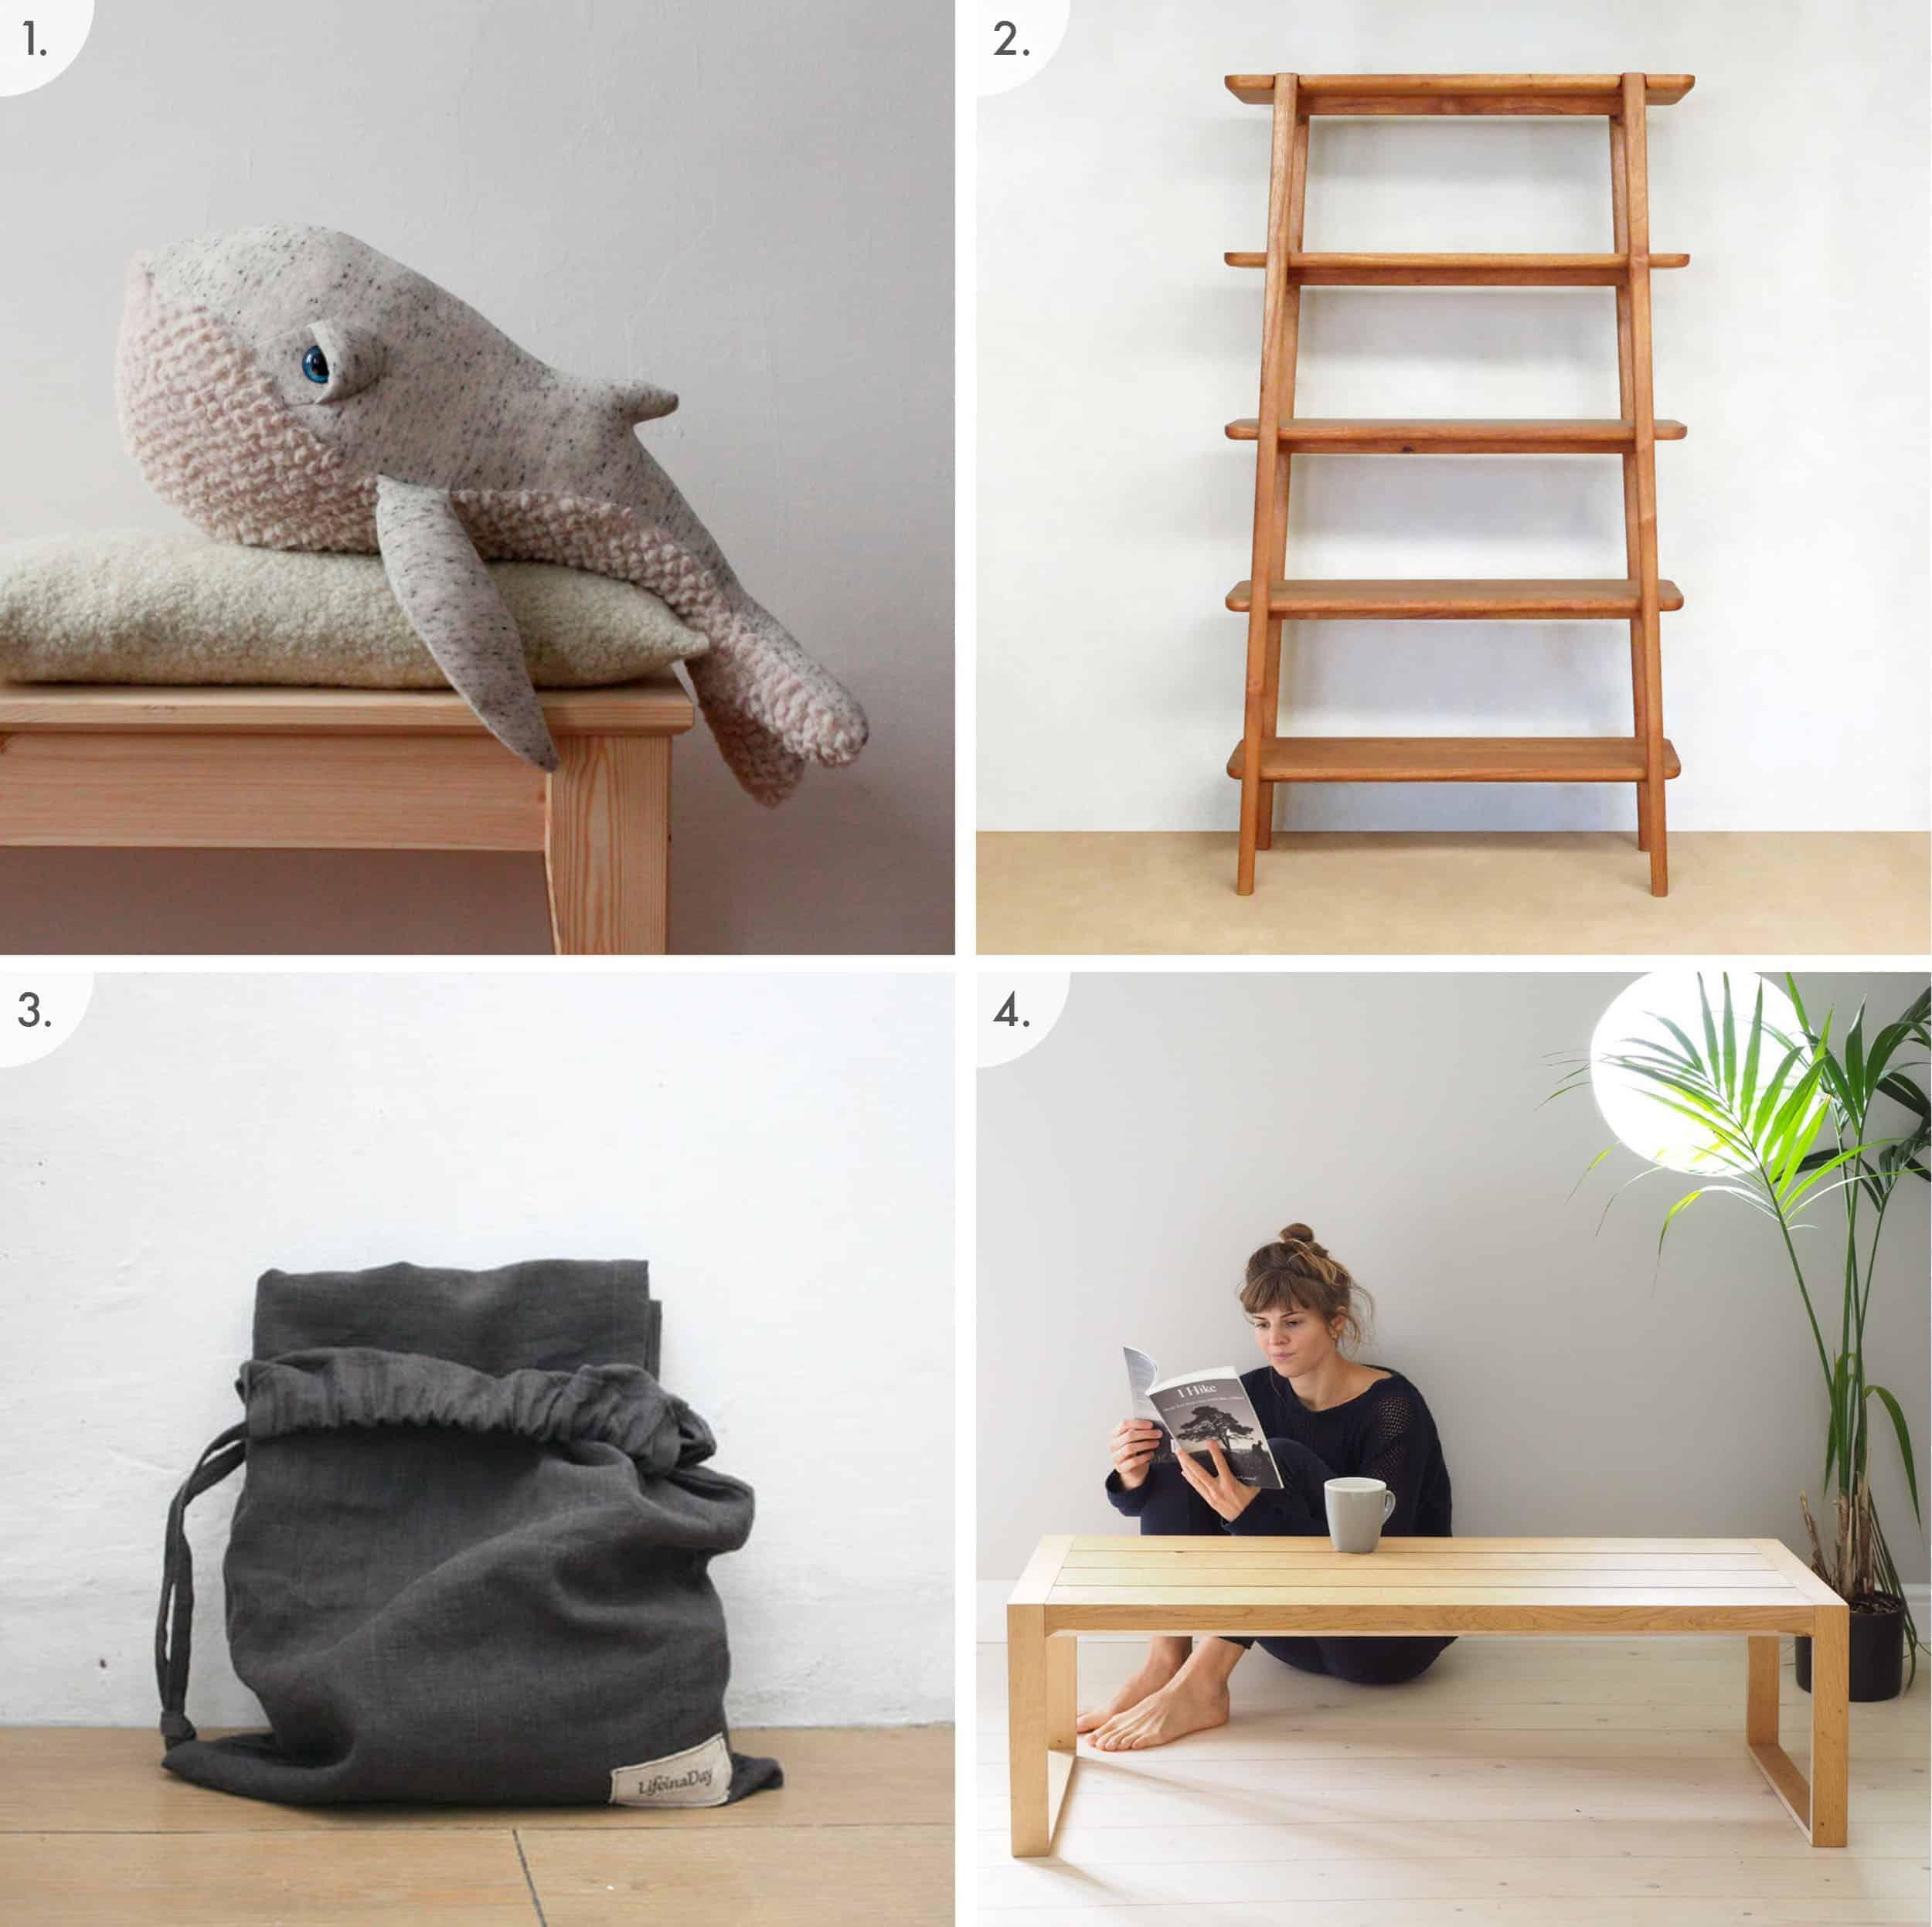 Whale Doll Midcentury Shelves Linen Picnic Blanket Minimal Modern Coffee Table